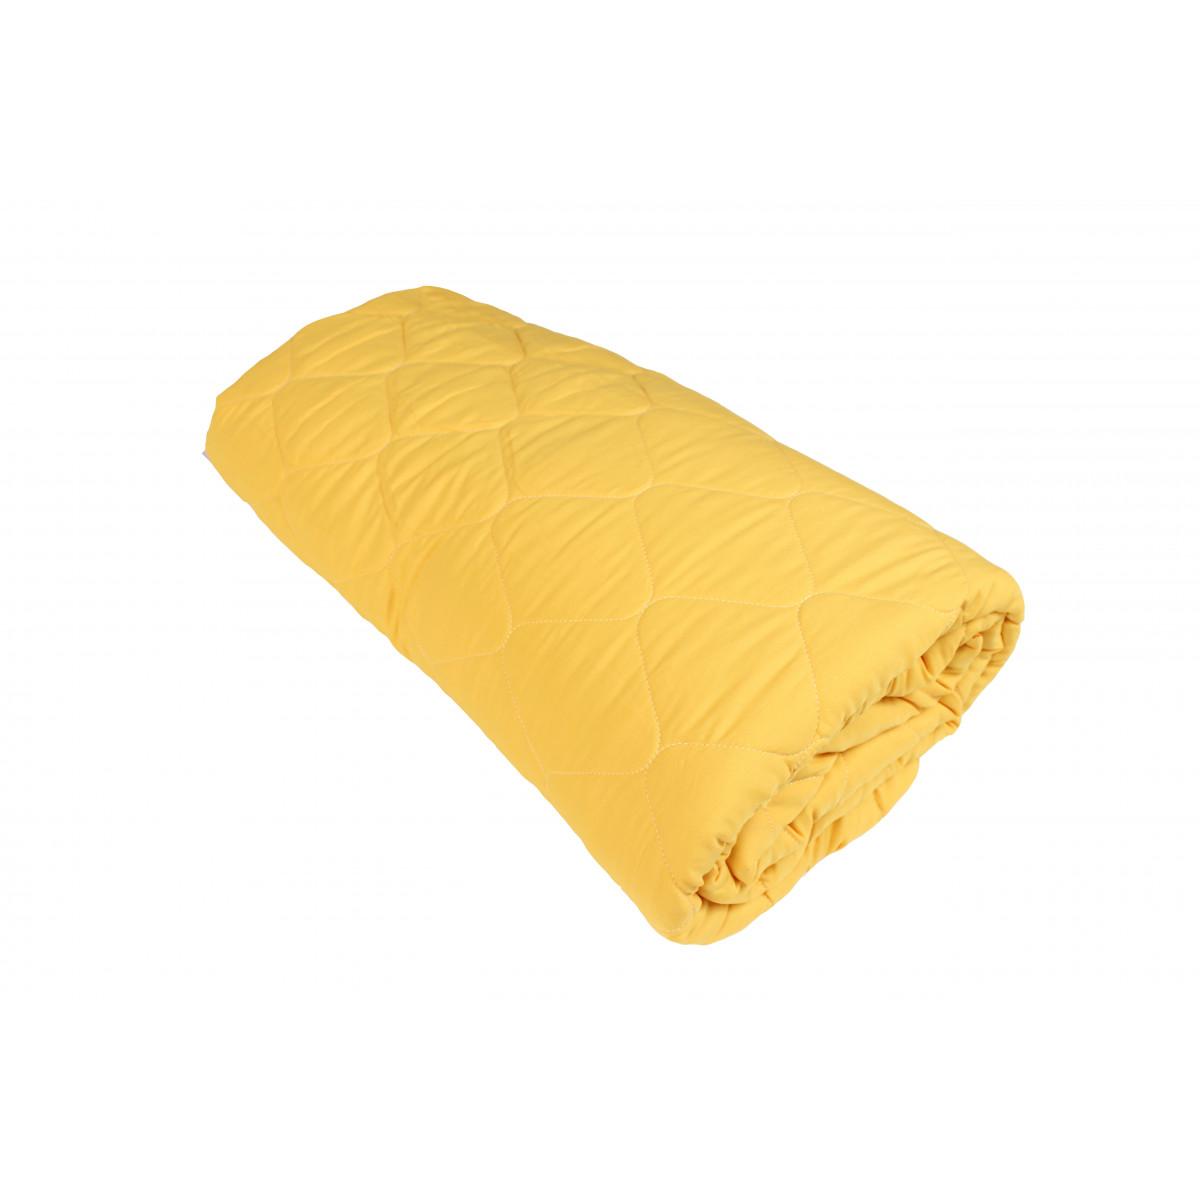 Пролетно покривало за легло 100% - полиестер 200/210 -120гр/м2 - Жълто